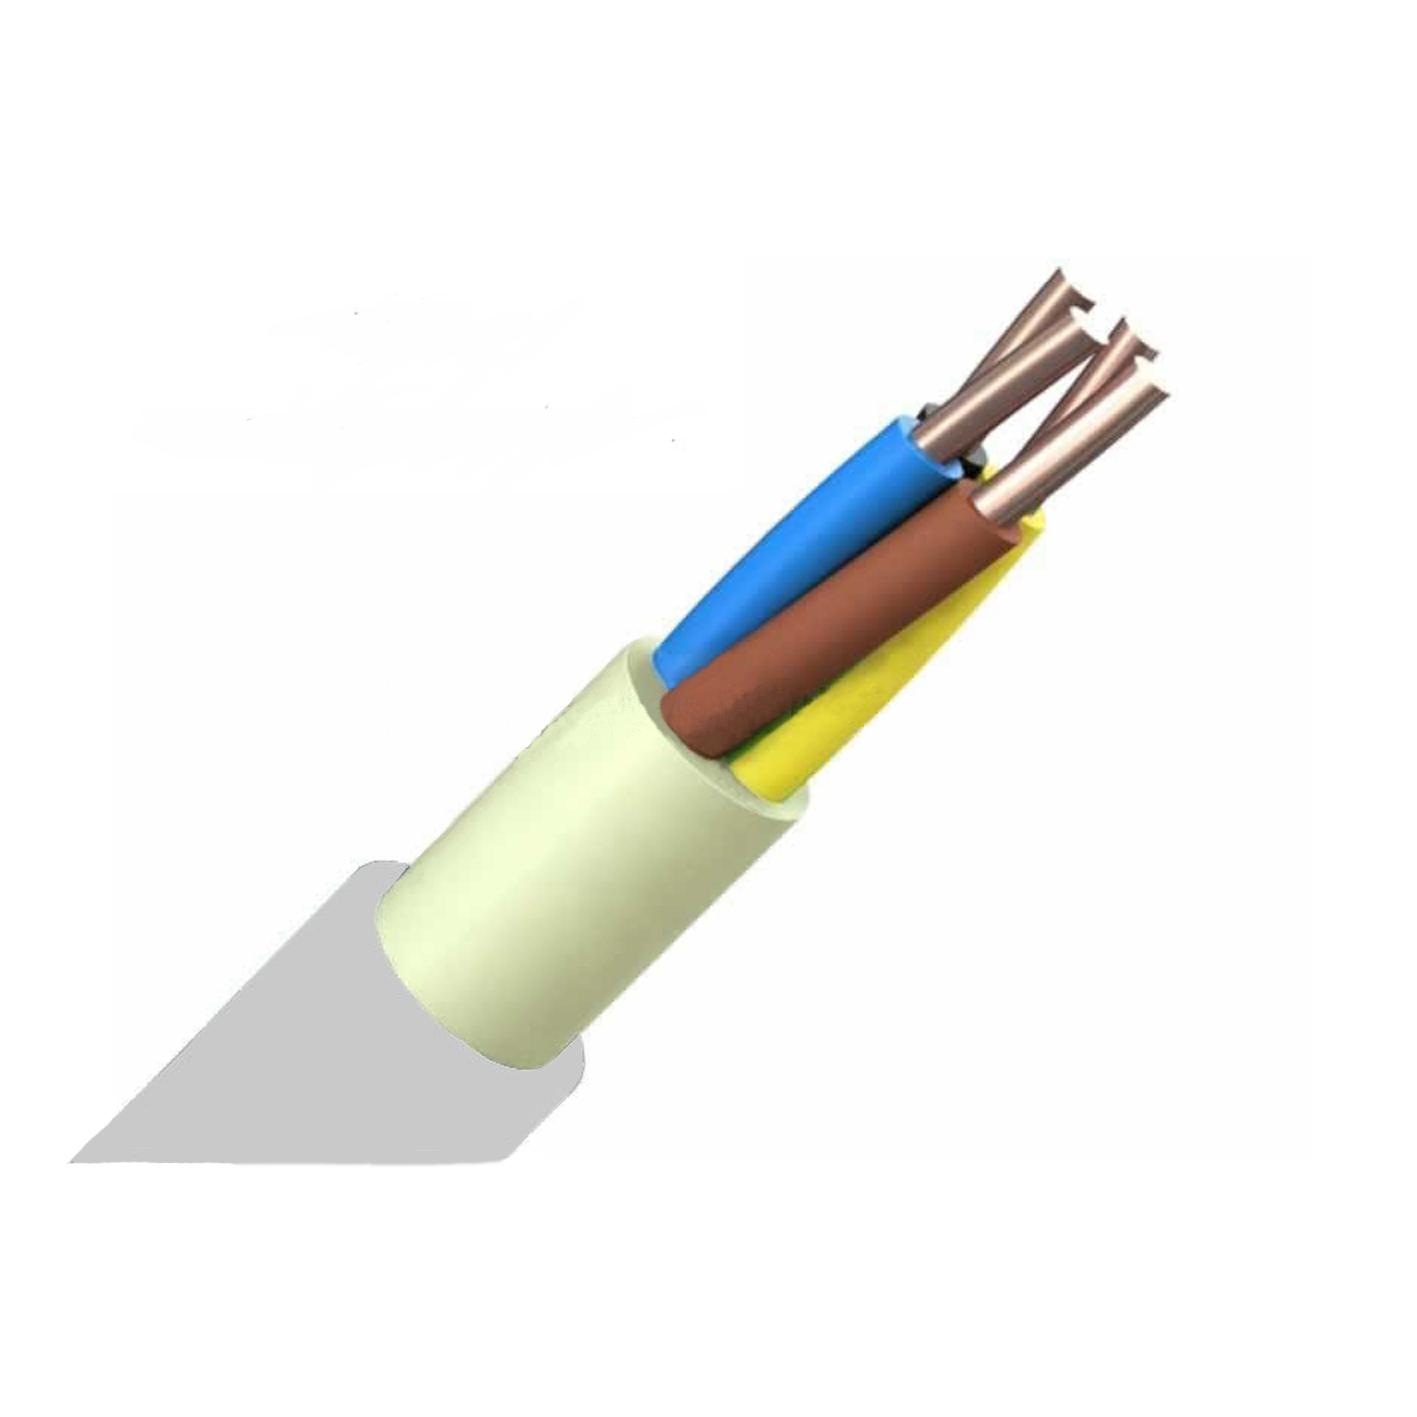 Öznur 4x2.5 NYM (NVV) Kablo